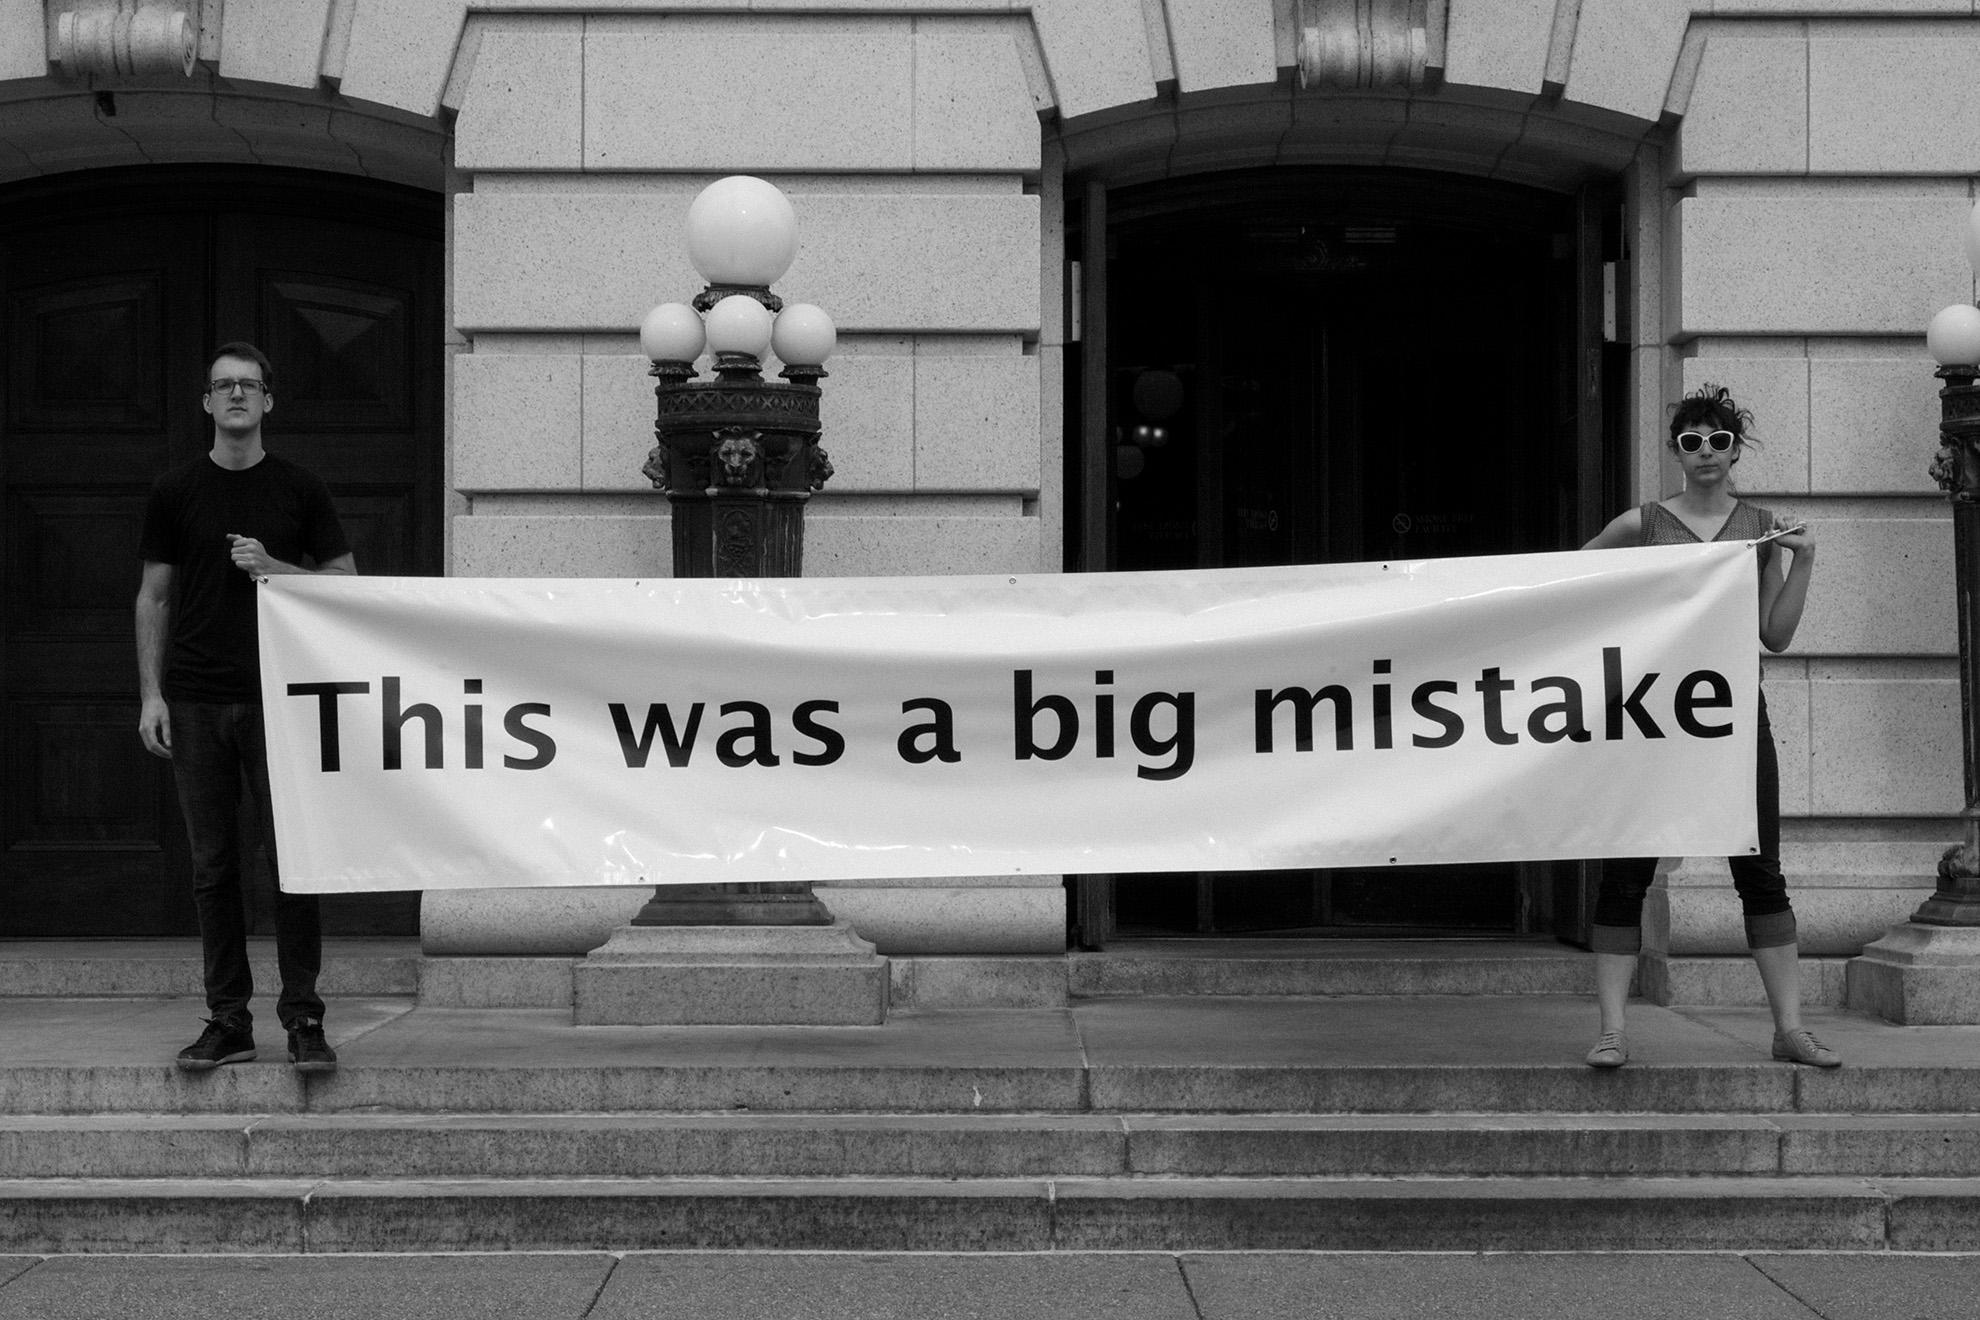 bigmistakeprotest-15.jpg